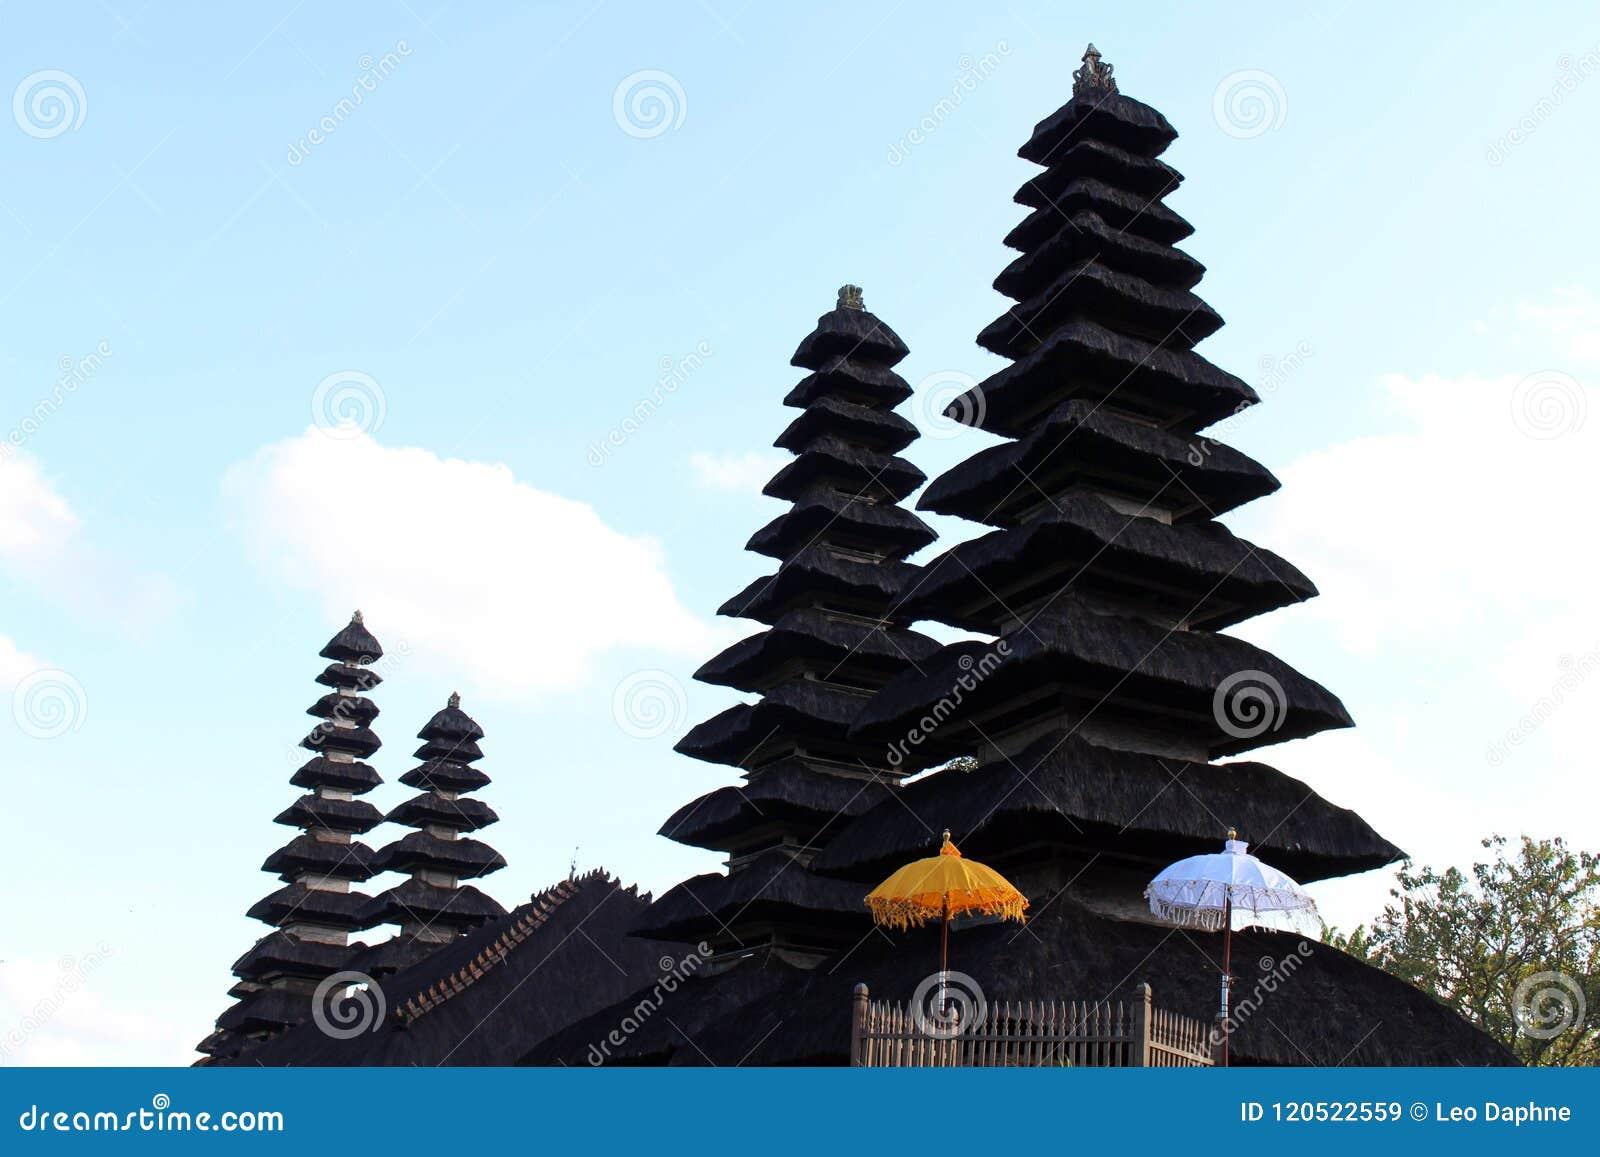 Around pura ayun temple and garden complex peaceful and serene